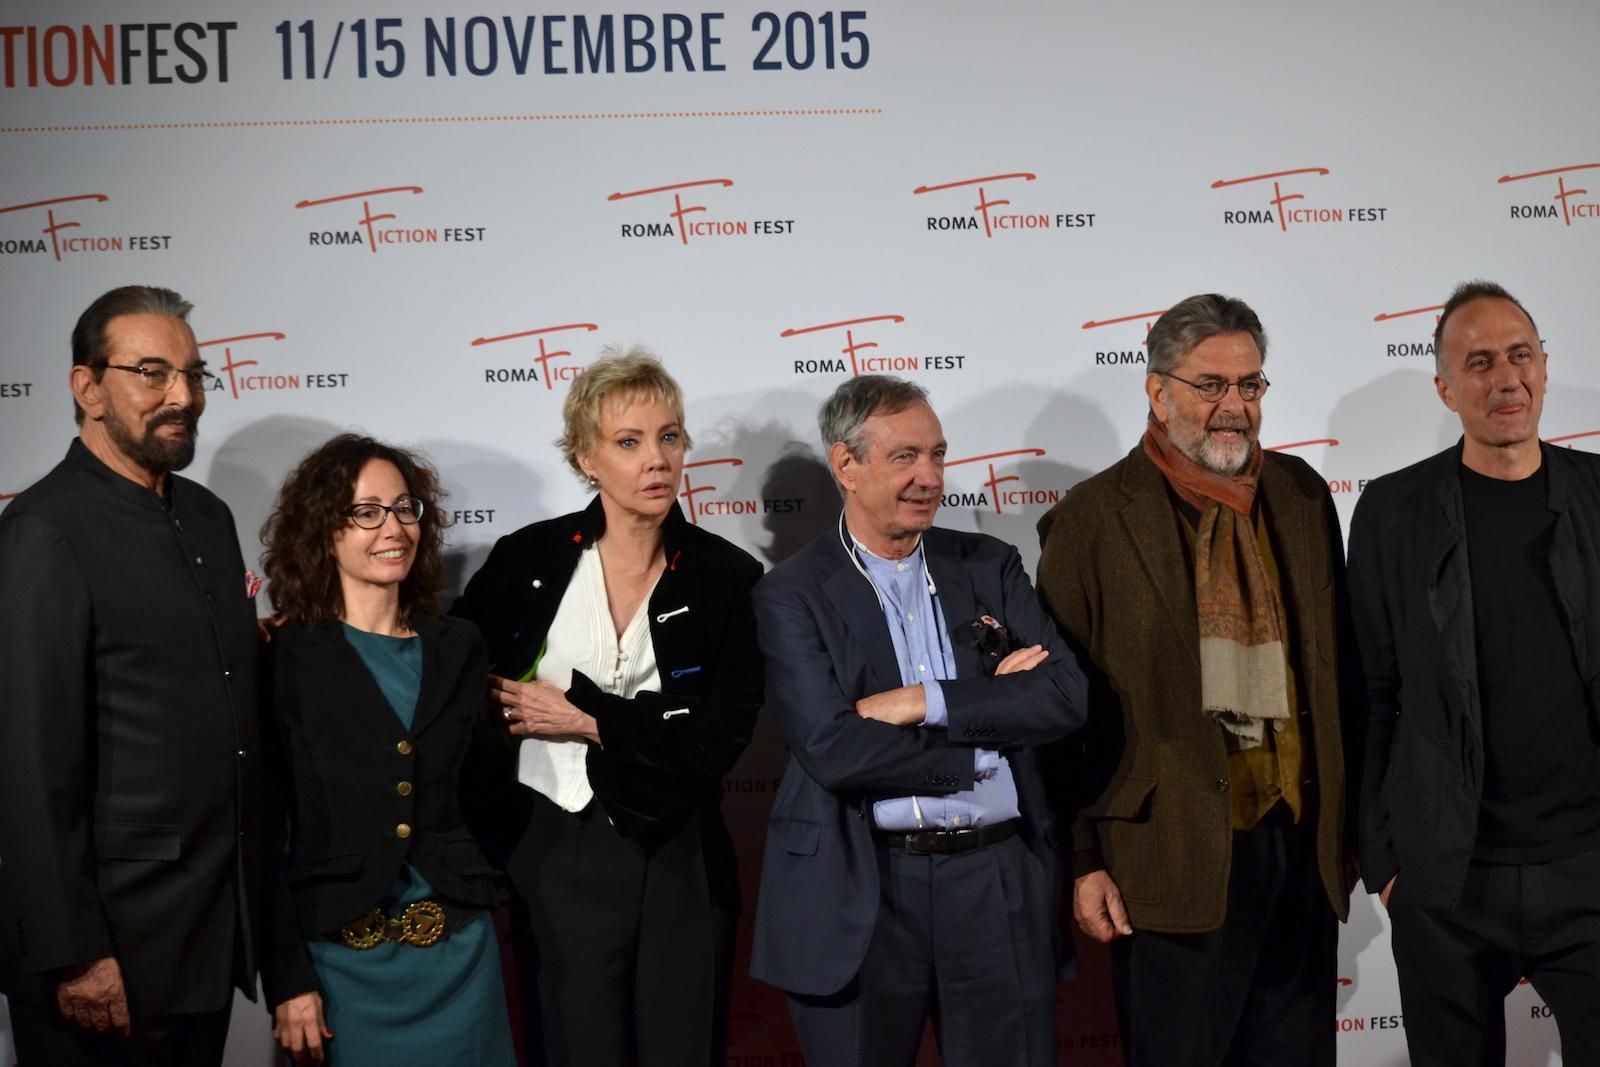 Roma Fiction Fest 2015: Kabir Bedi, Carole André, Stefano Sollima, Samanta Sollima, Andrea Giordana posano sul red carpet di Sandokan